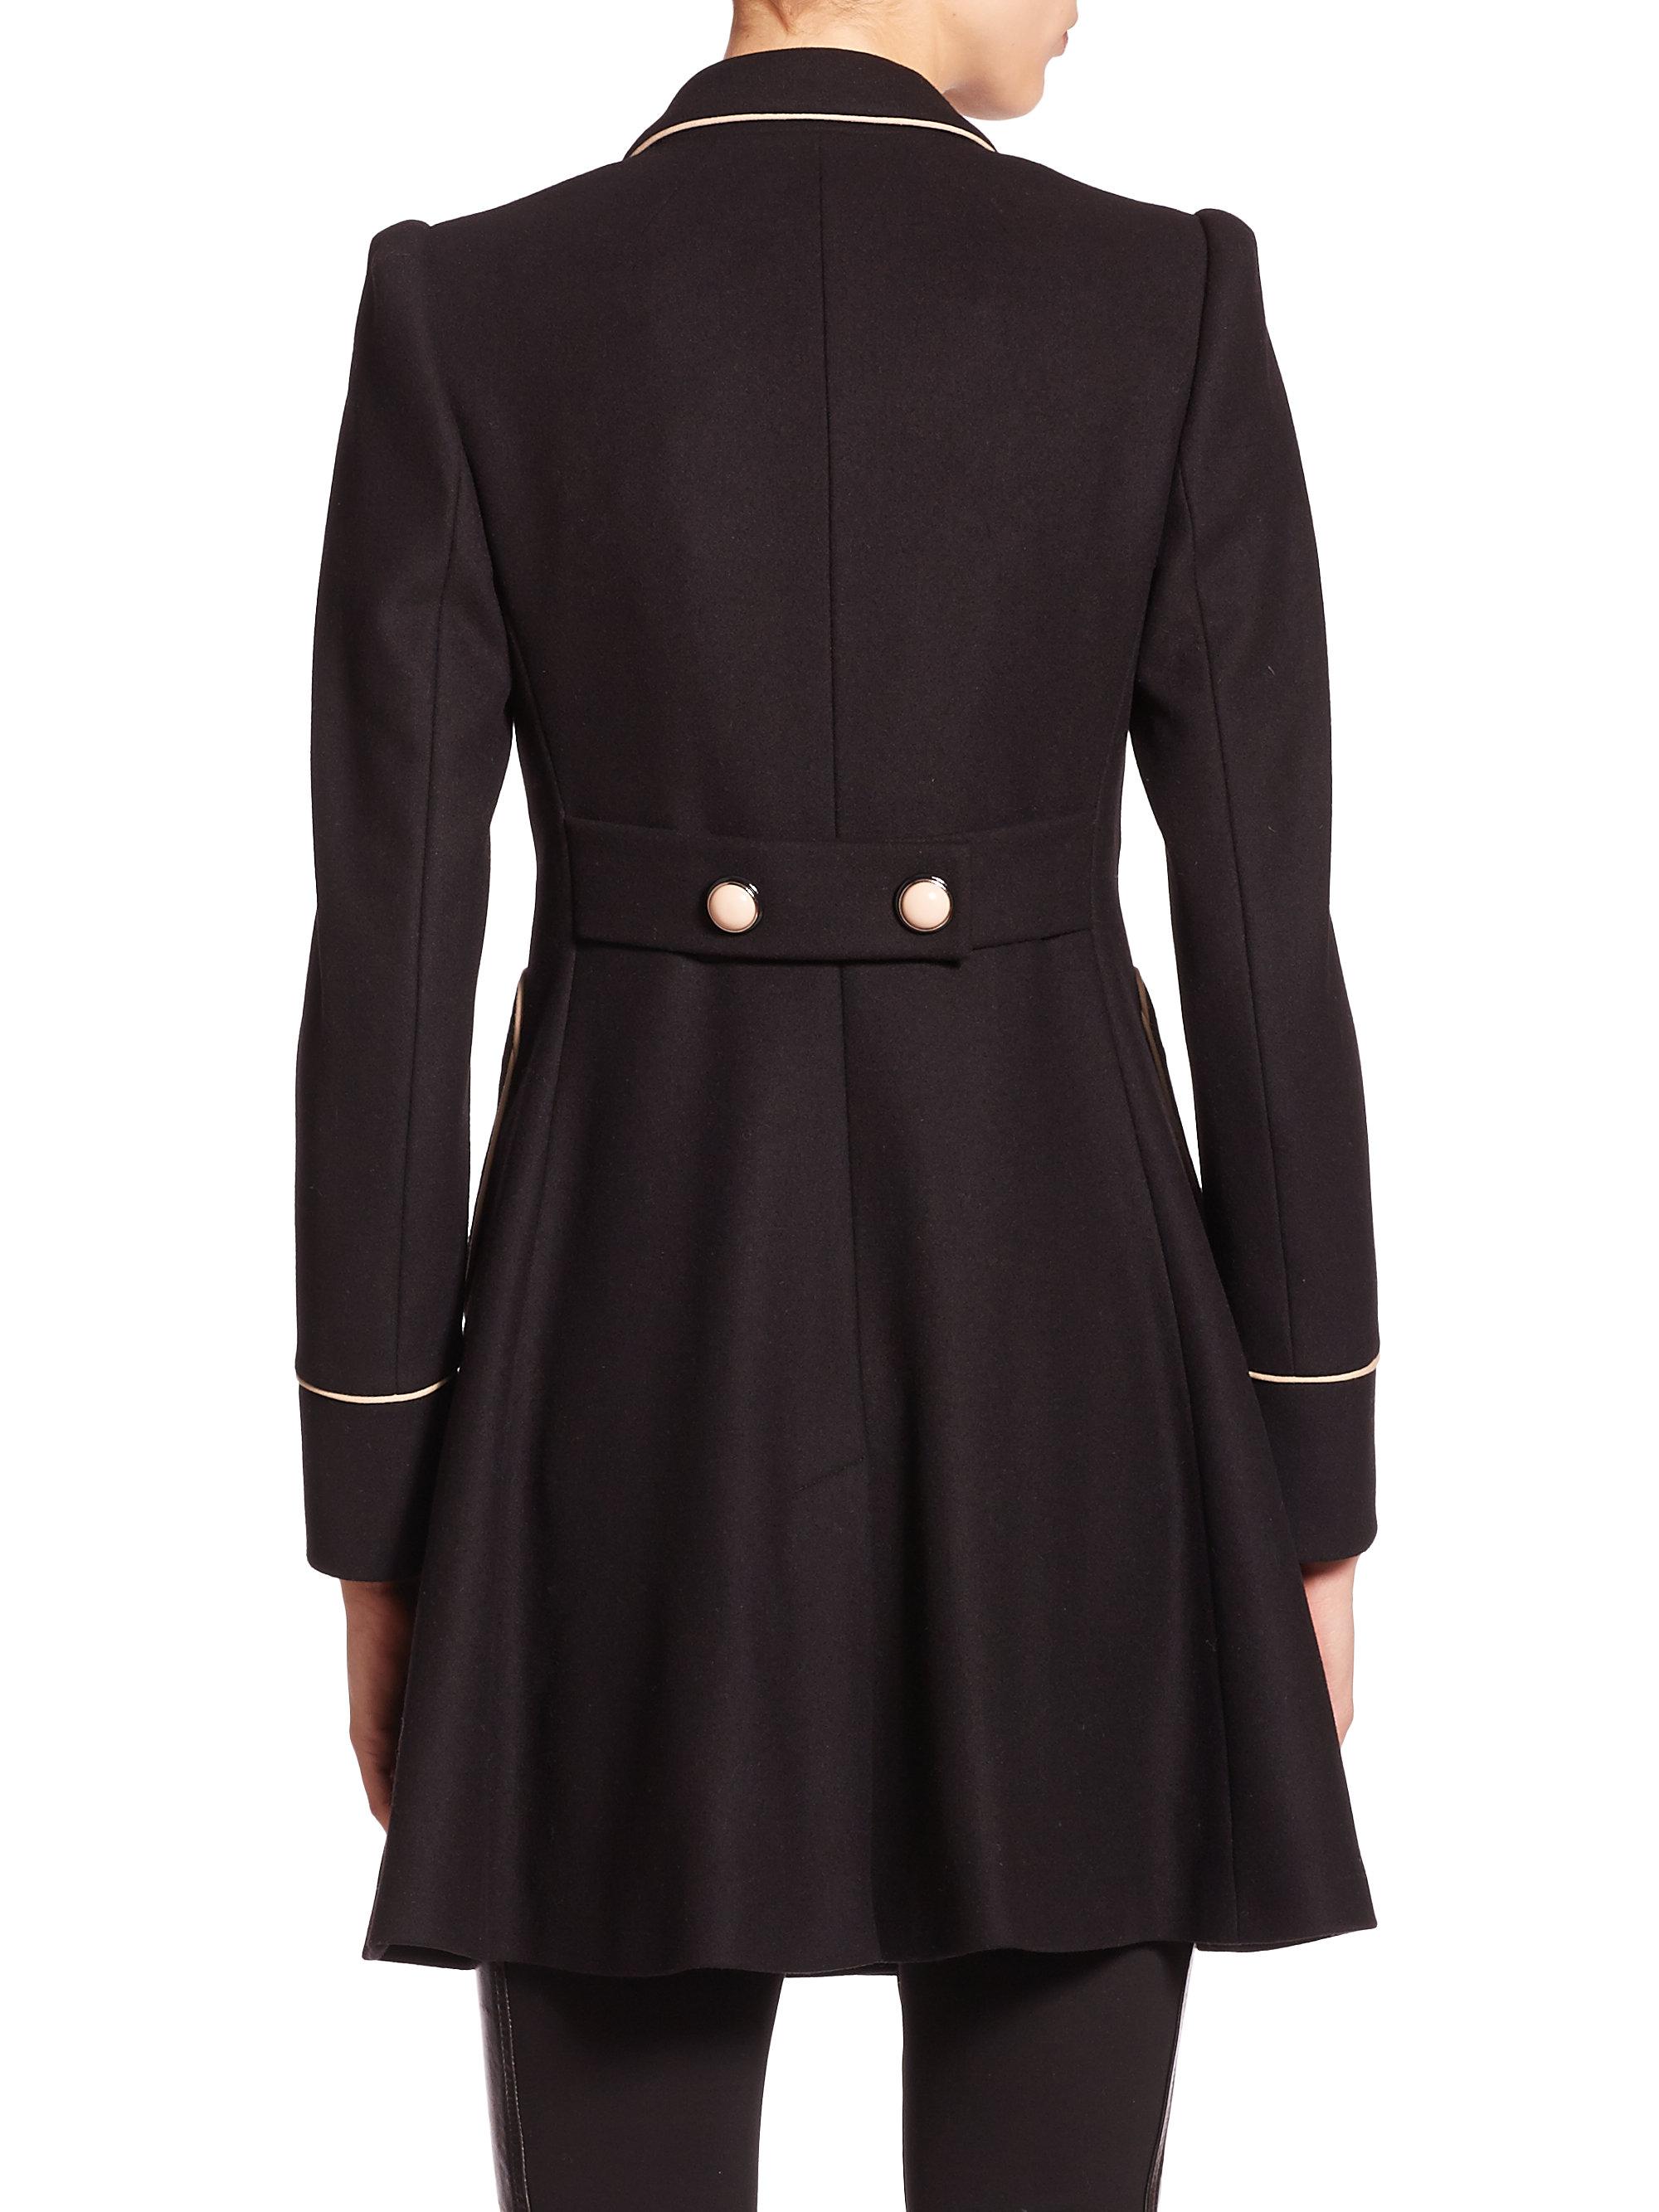 9f80c620de33 RED Valentino Black Contrast-trim Wool-blend Coat